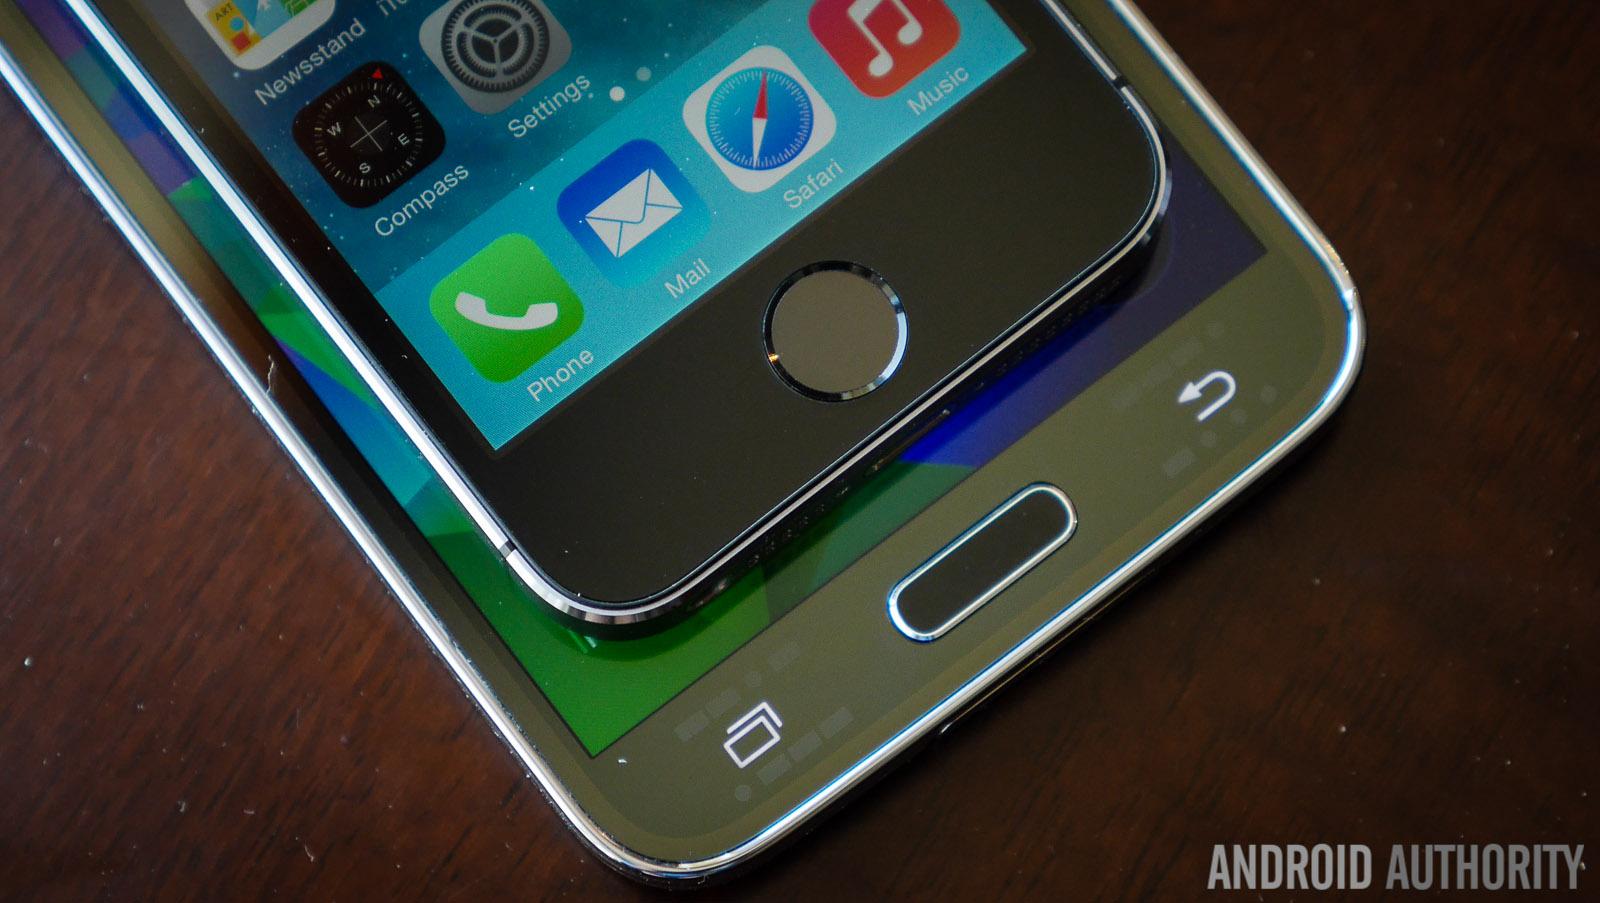 galaxy s5 vs iphone 5s aa (4 of 14)